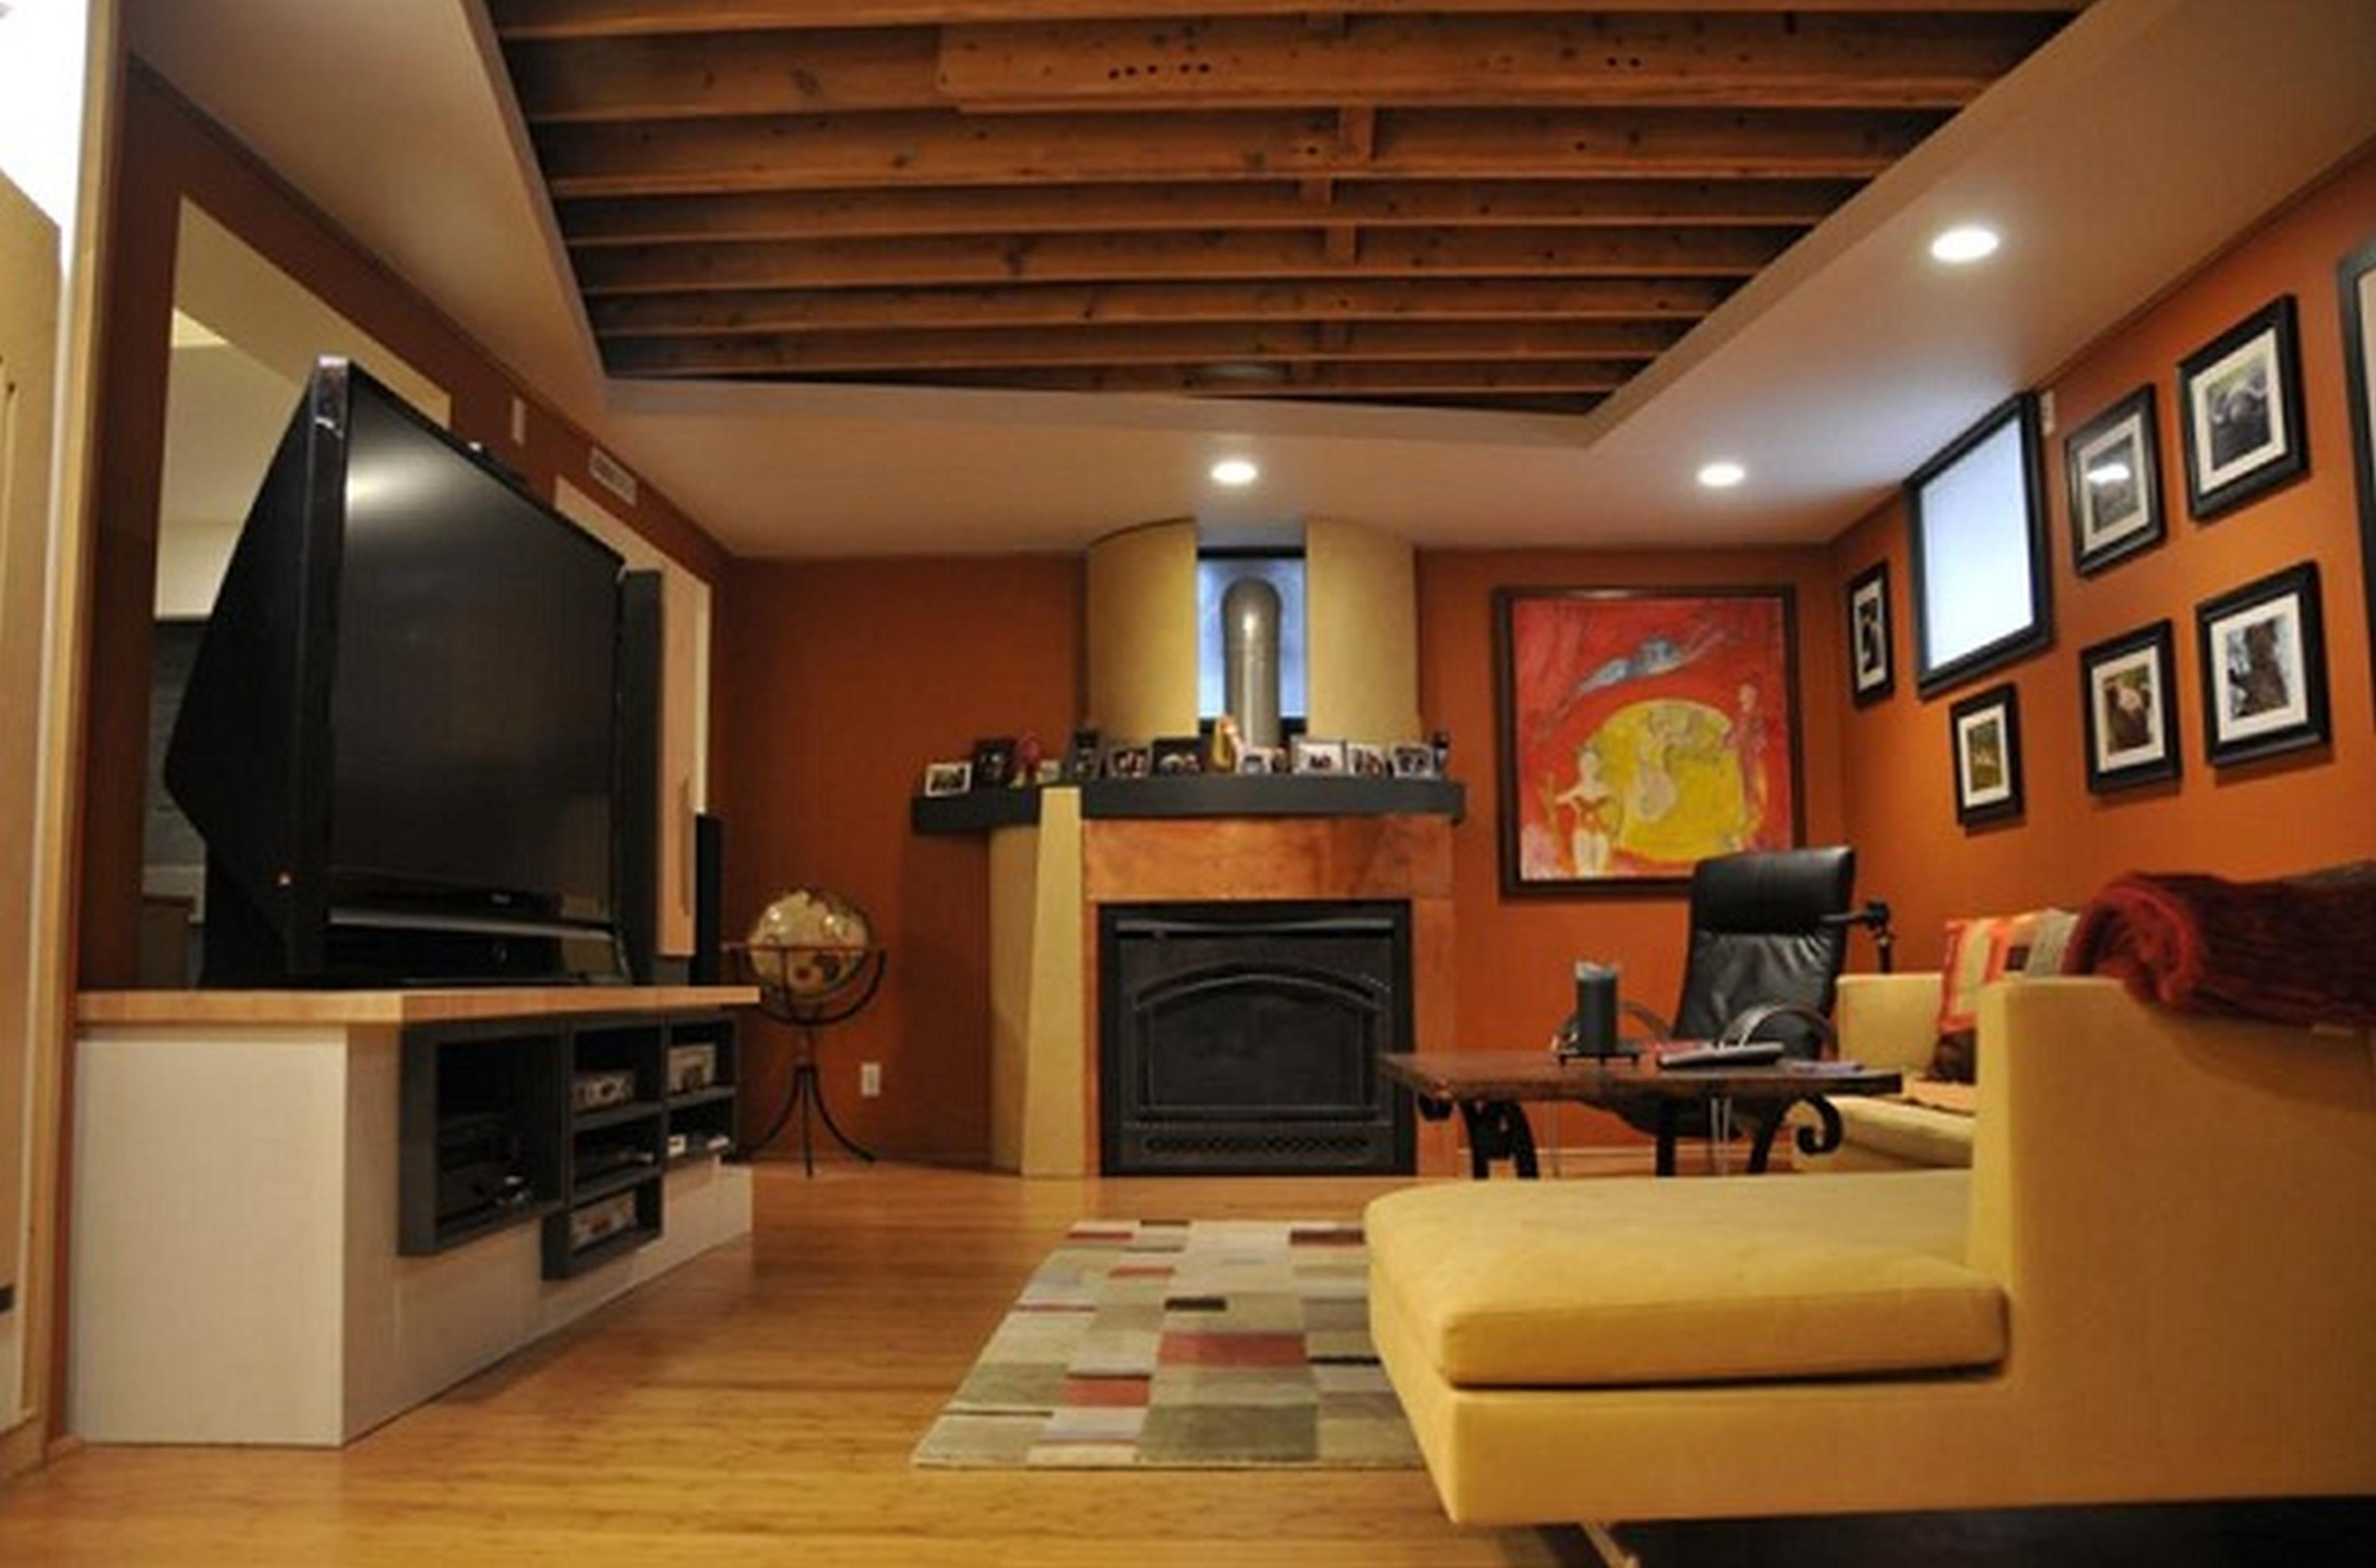 Best ideas about Pinterest Basement Ideas . Save or Pin Basement Bar Ideas Pinterest Living Room GoodHomez Now.